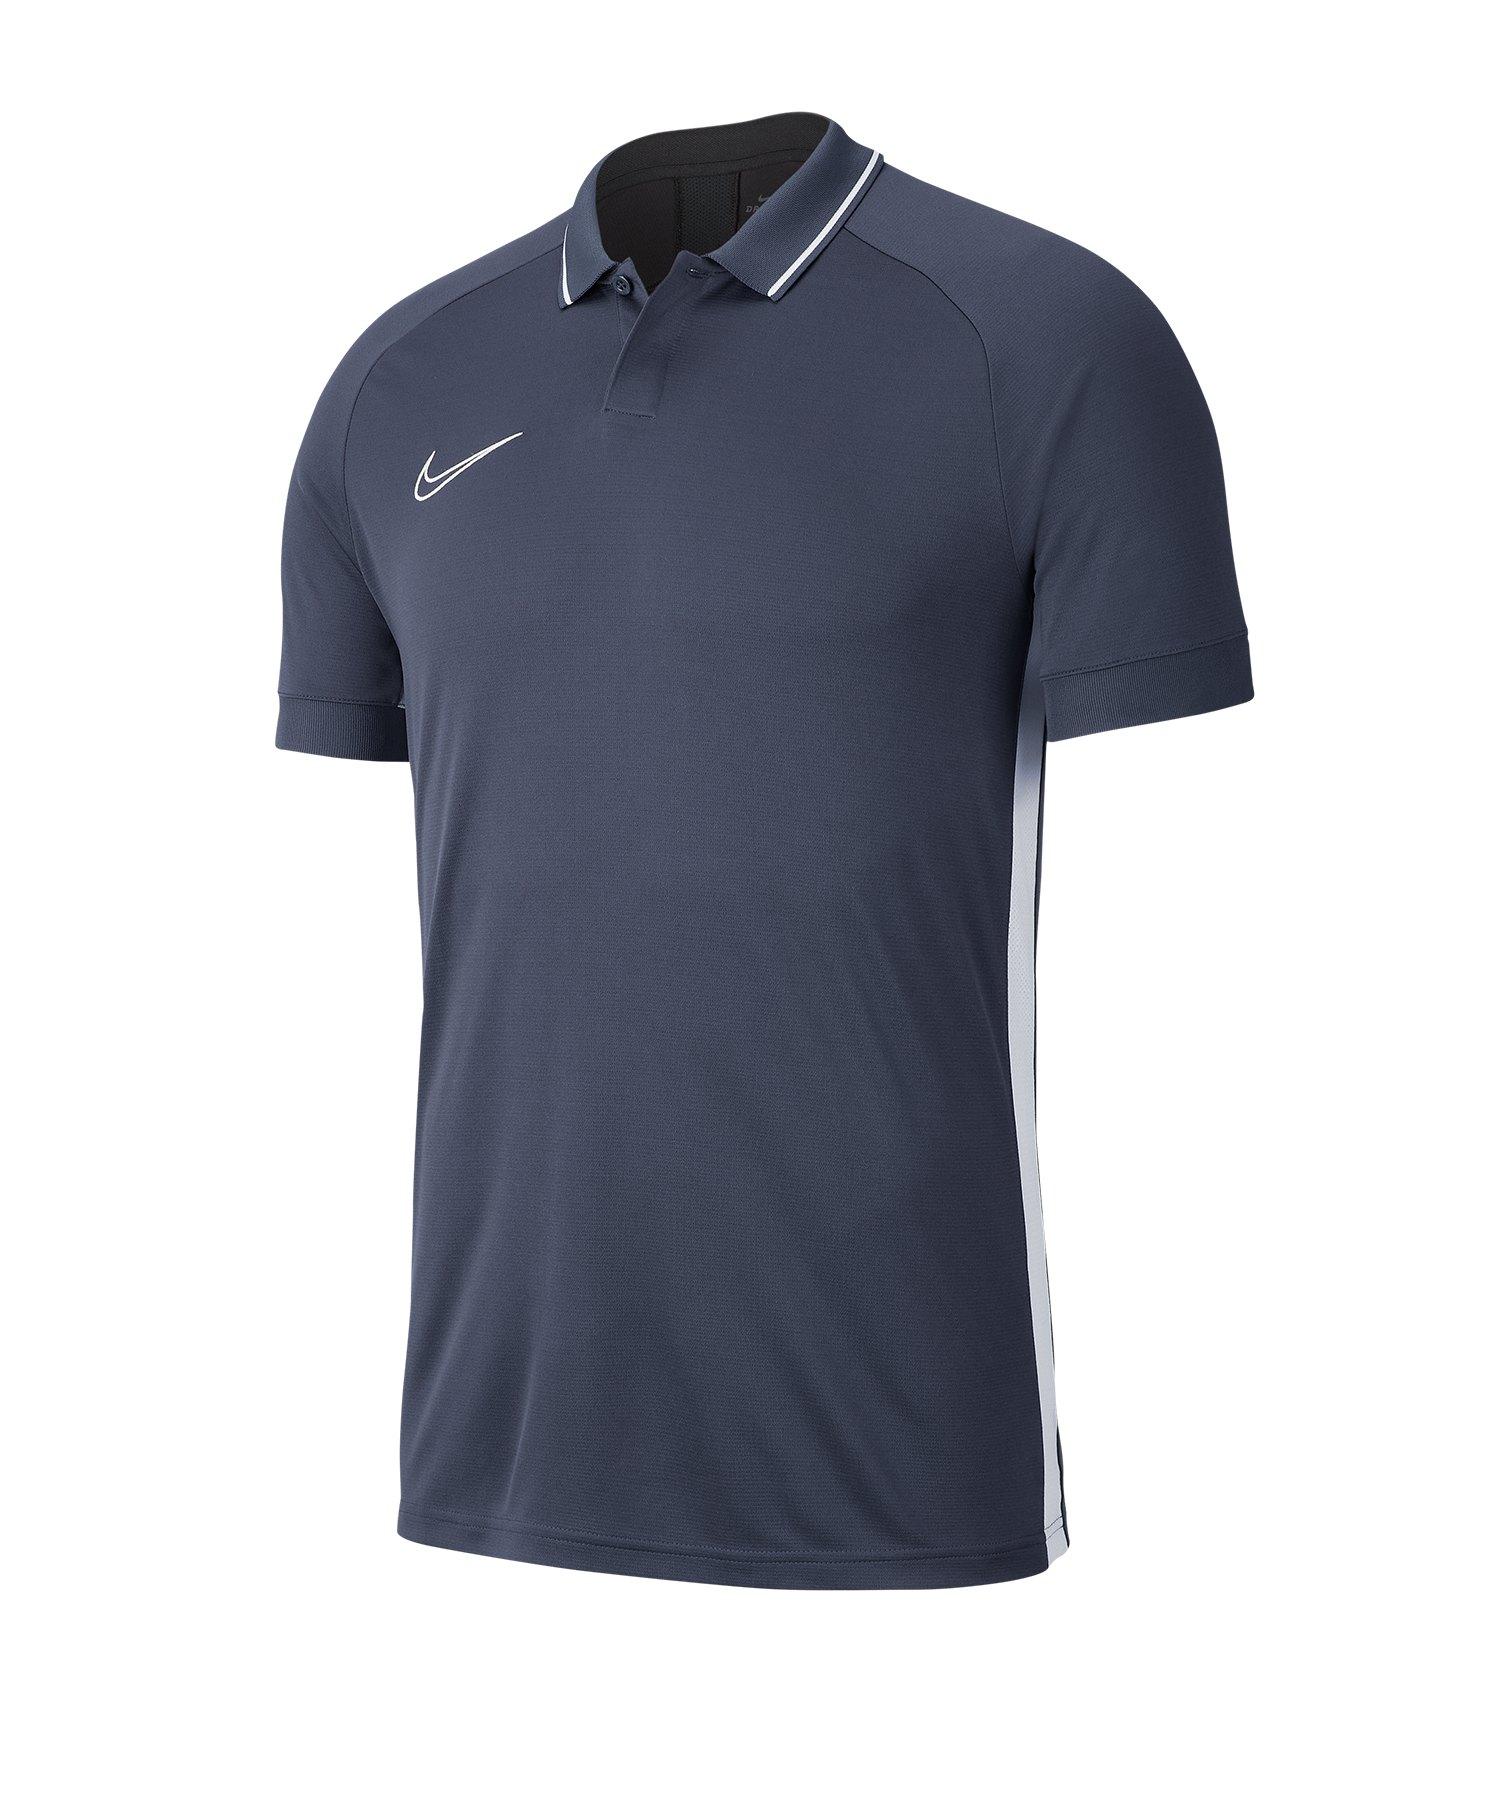 Nike Academy 19 Poloshirt Grau Weiss F060 - grau